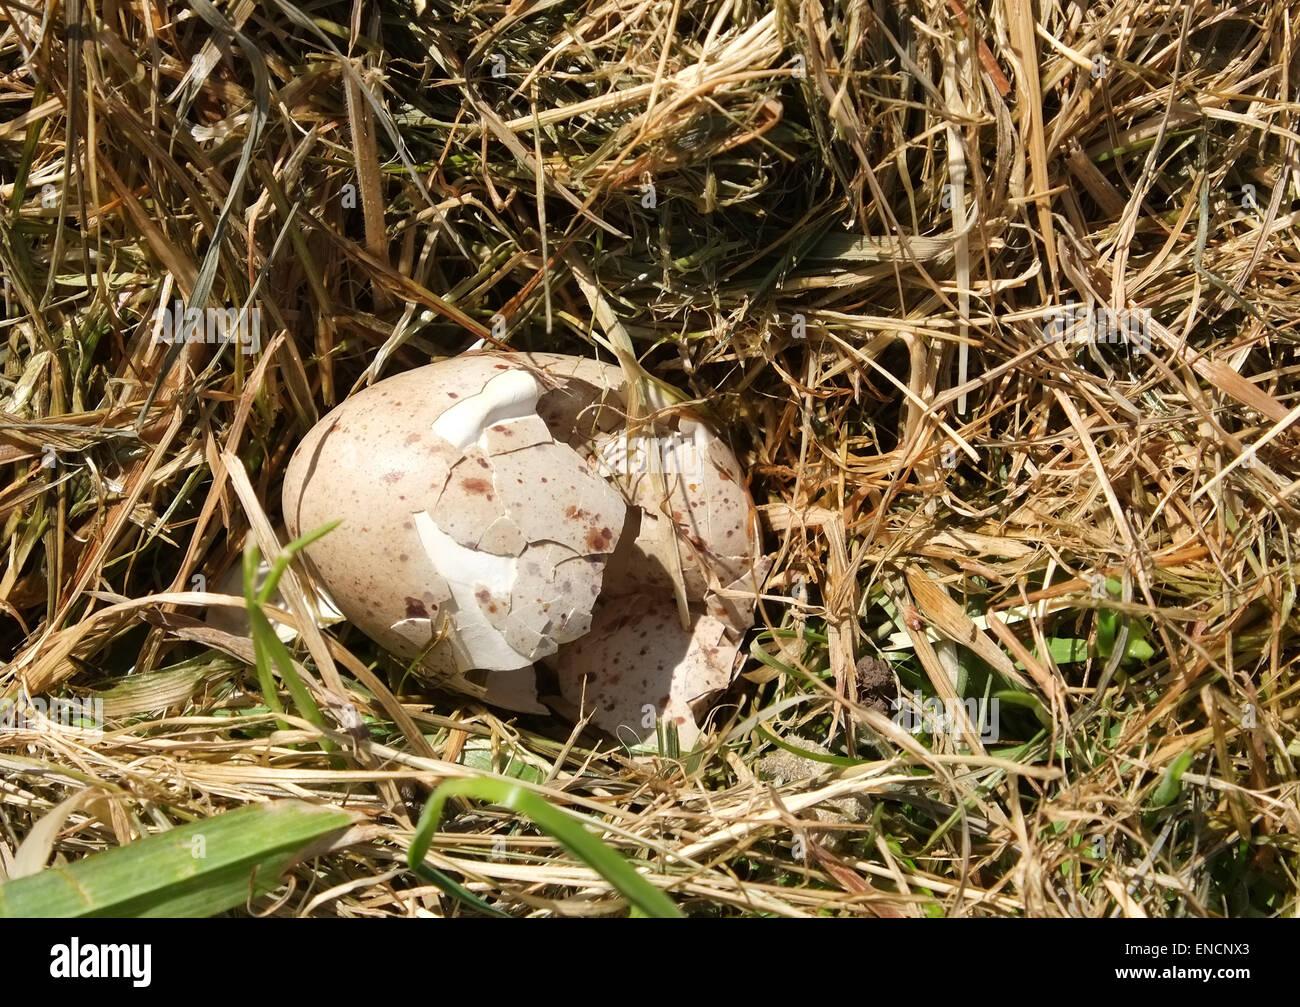 Broken birds egg in rural South Gloucestershire, 29th April 2015 - Stock Image